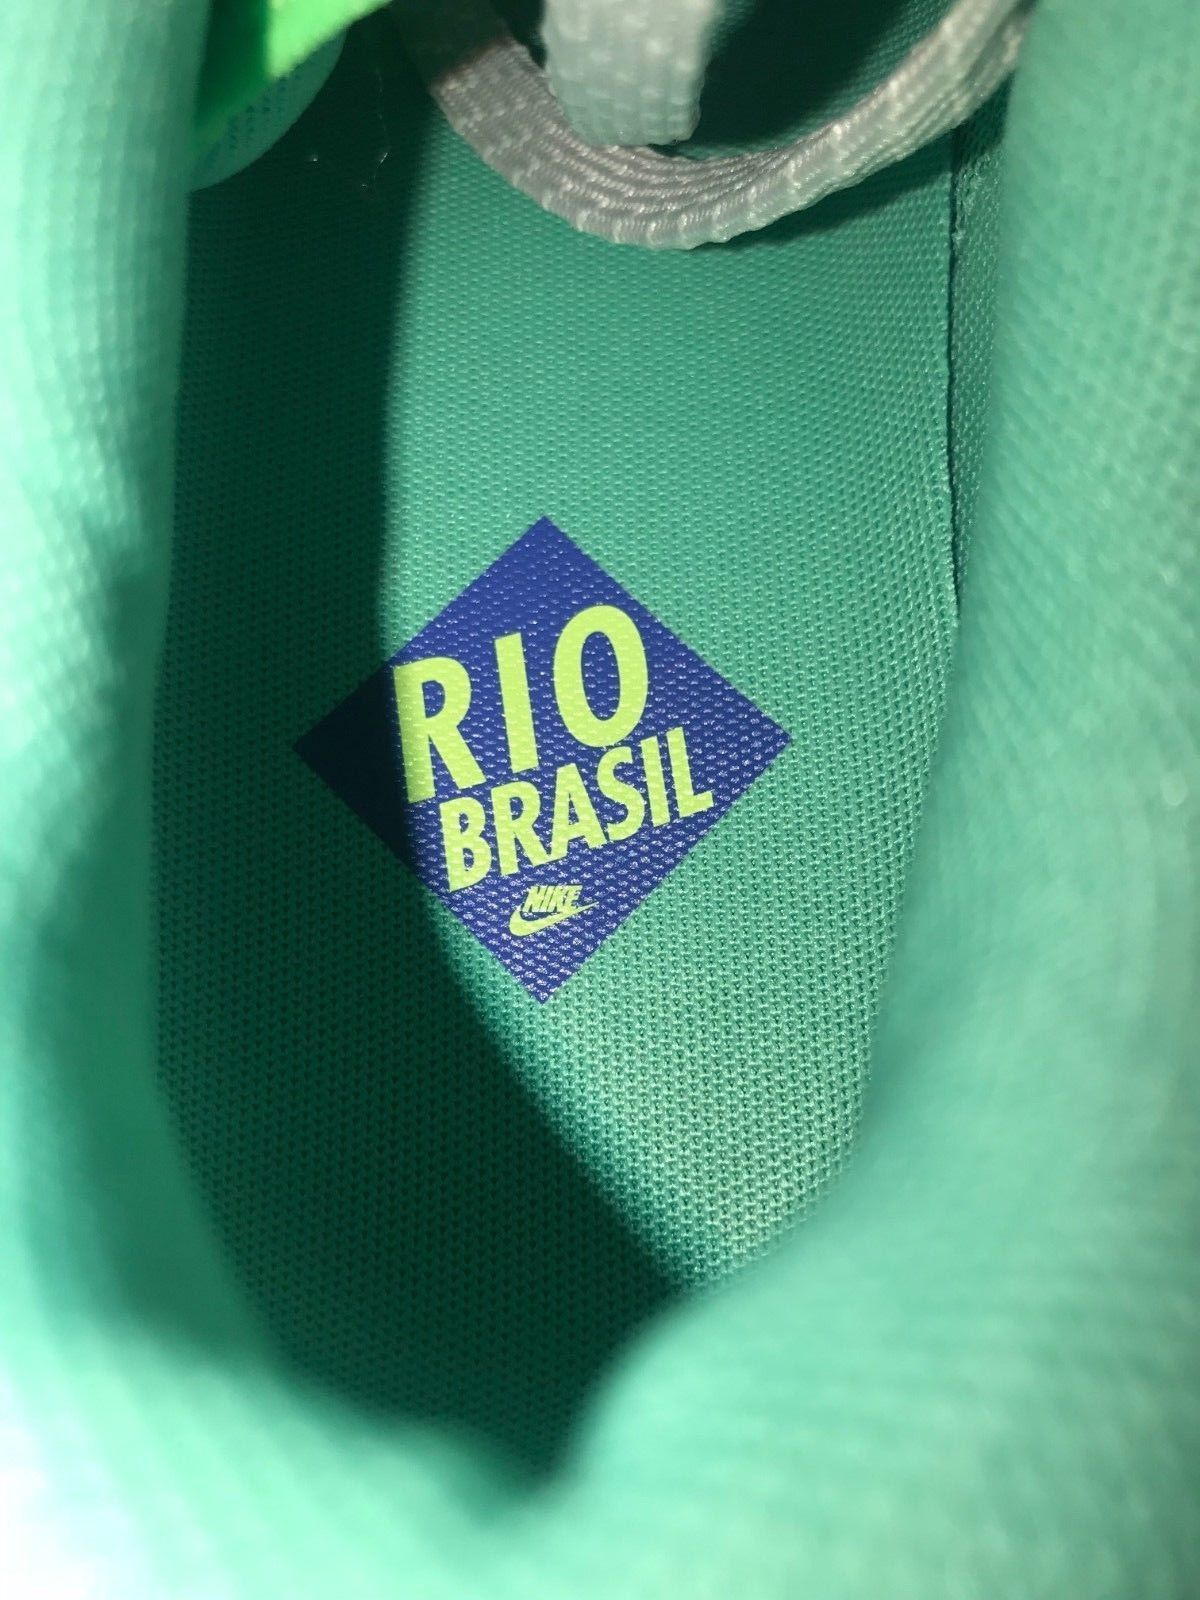 Nike Air Max 90 City QS Brazil Brasil Rio Men's Size 11 13 DS 667634 300